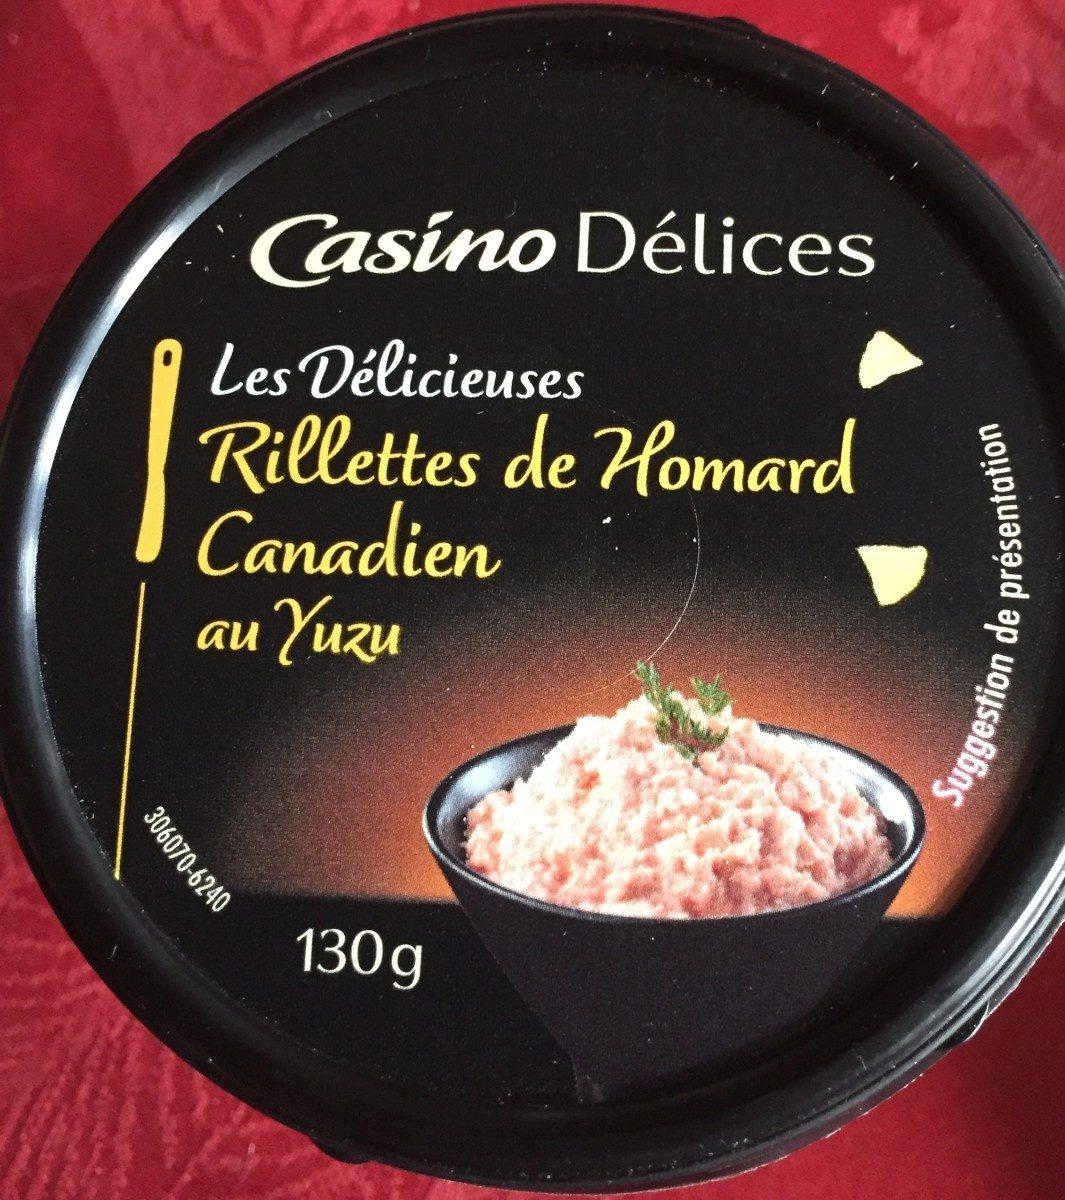 Rillettes de homard canadien au yuzu - Product